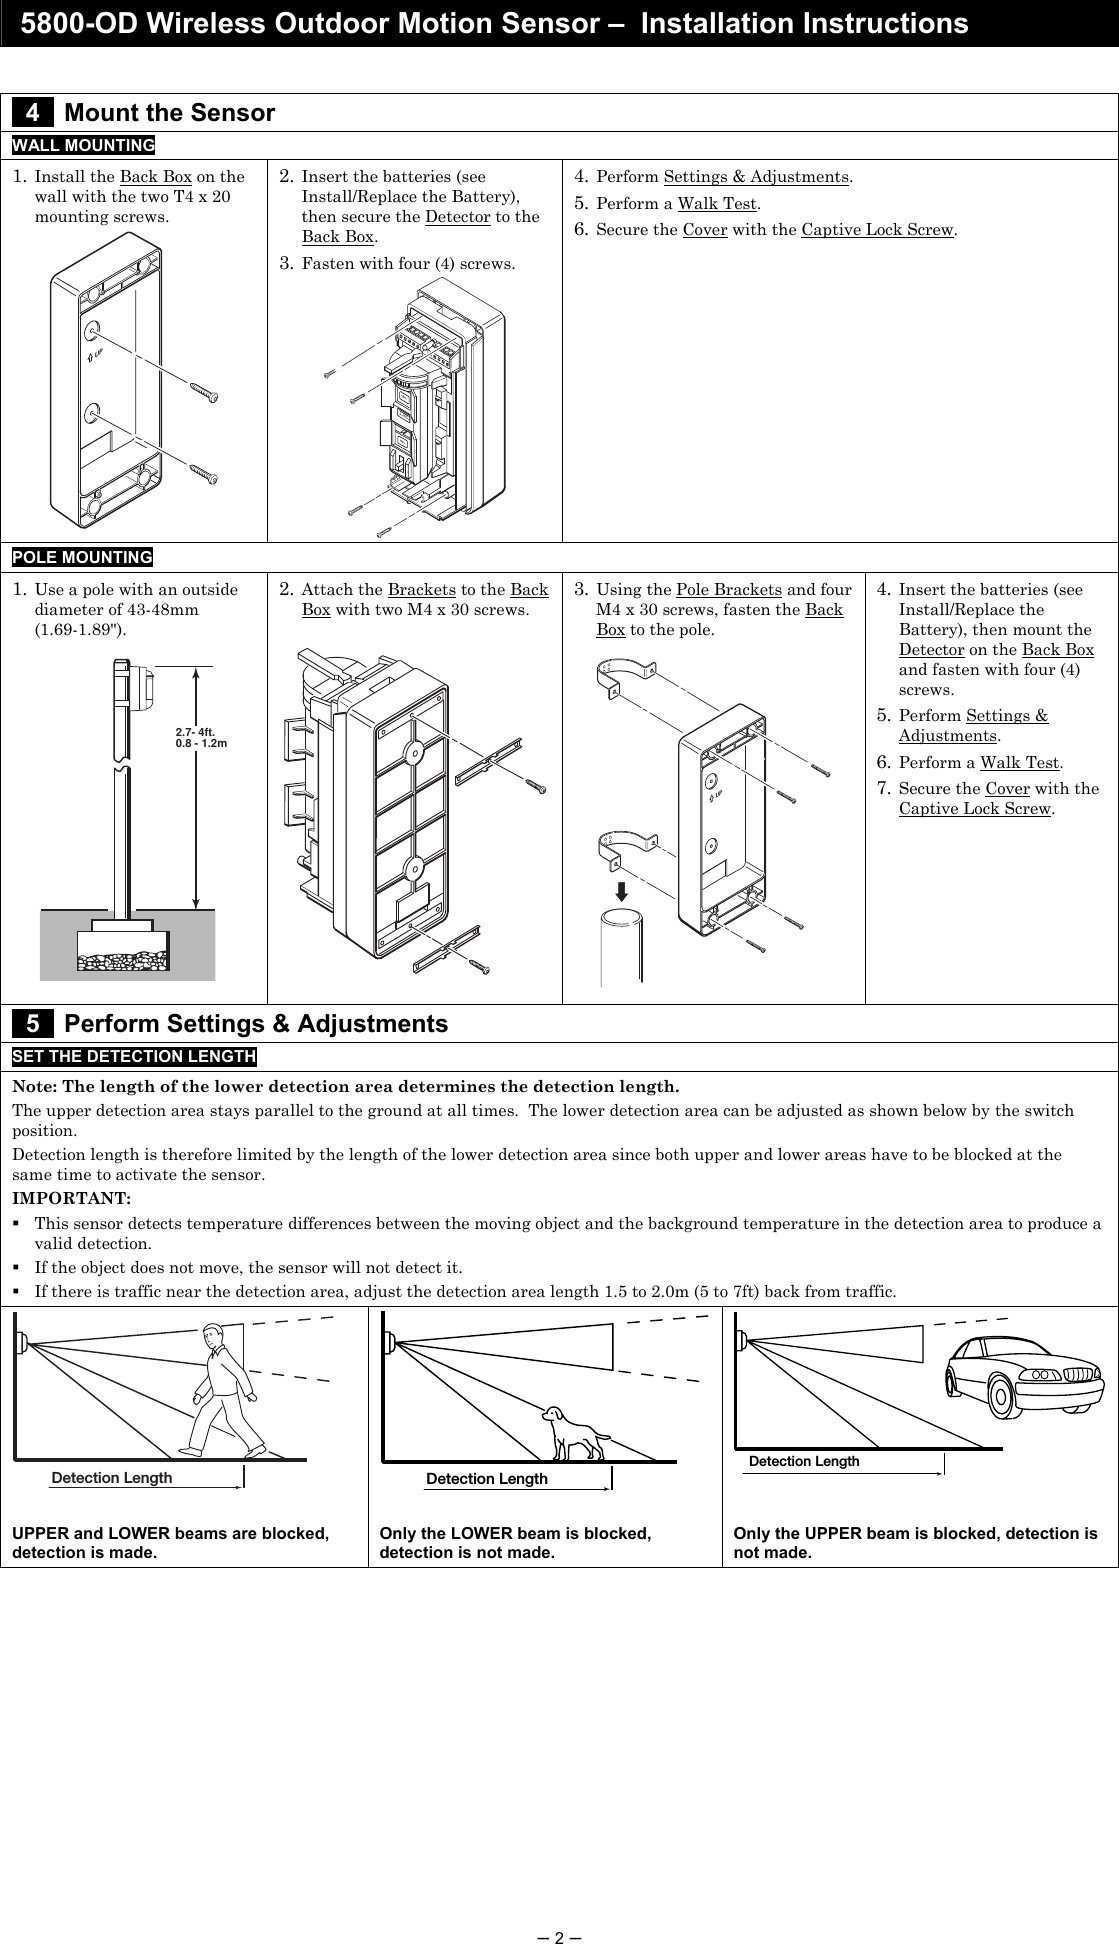 ejemplo de curriculum vitae basico en espanol cool mercury pi845z manual ebook of ejemplo de curriculum vitae basico en espanol